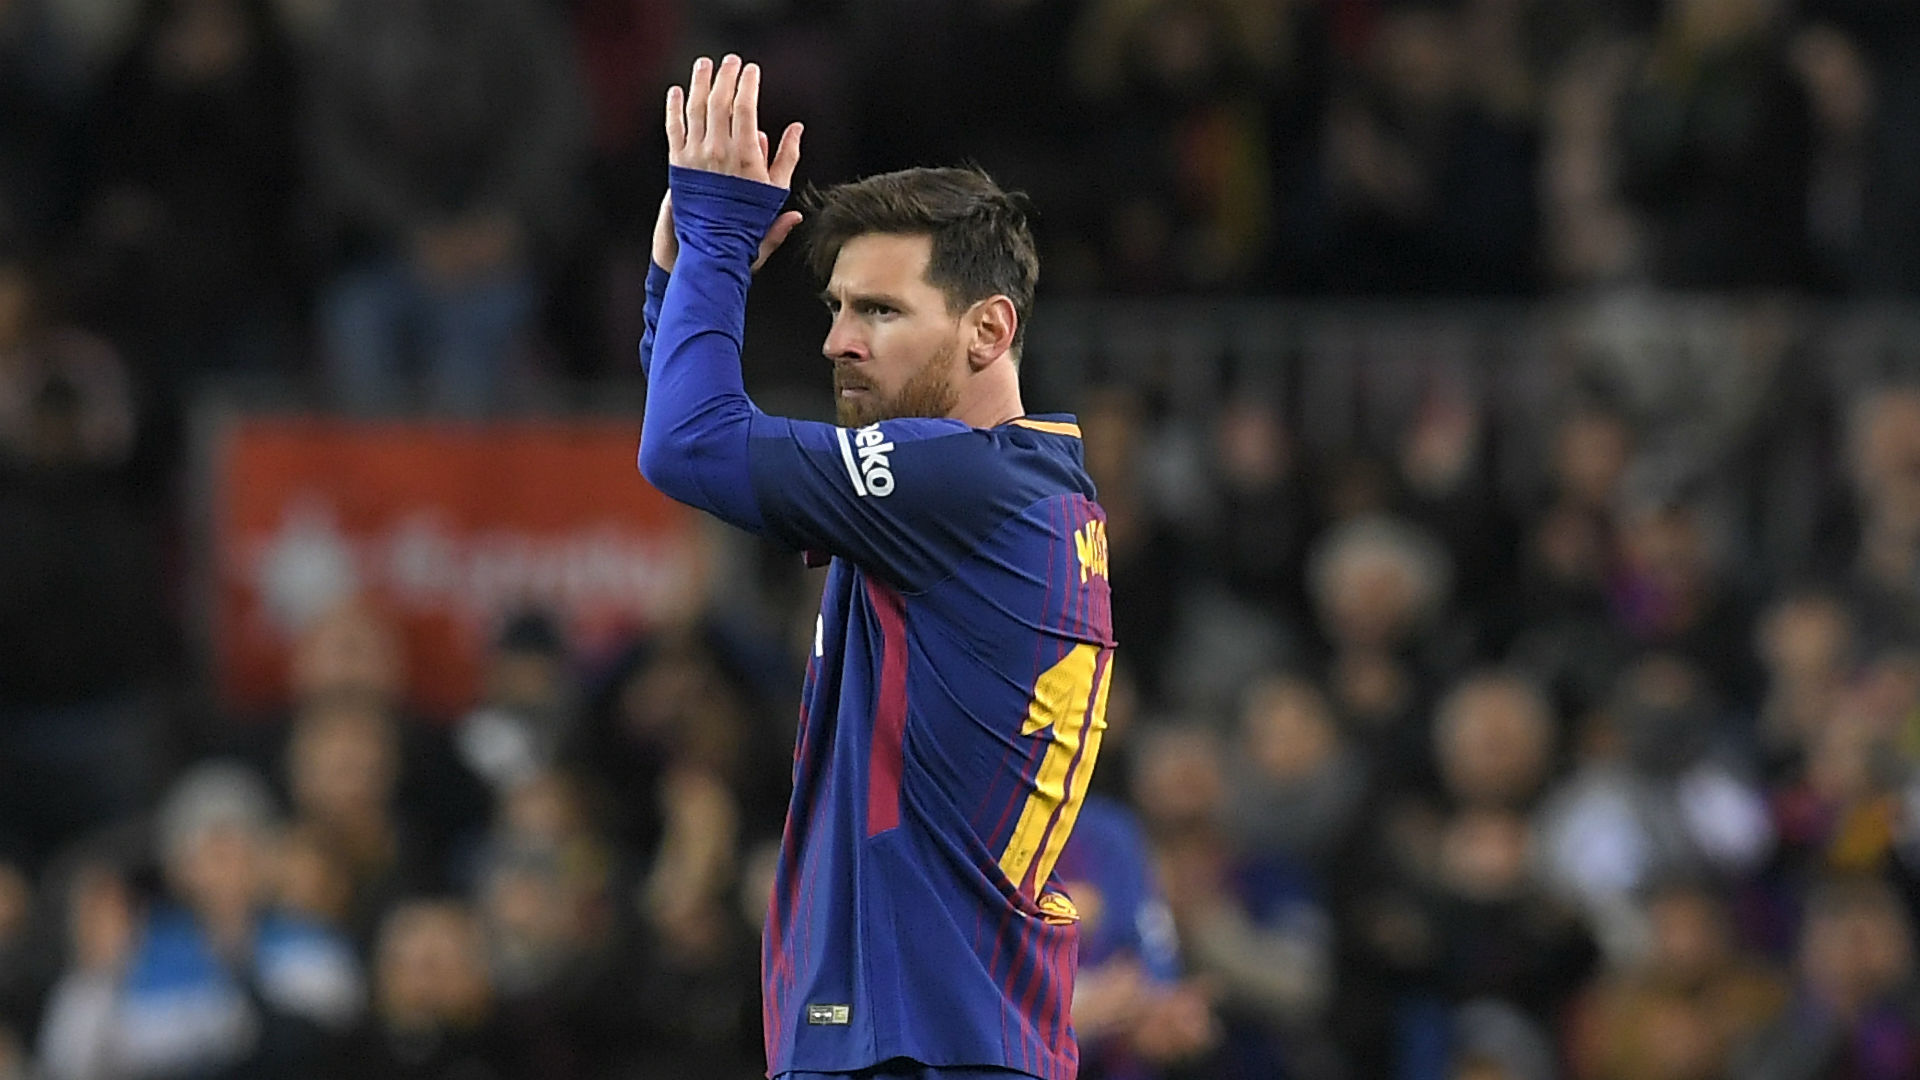 Messi and Barca trounce Celta Vigo